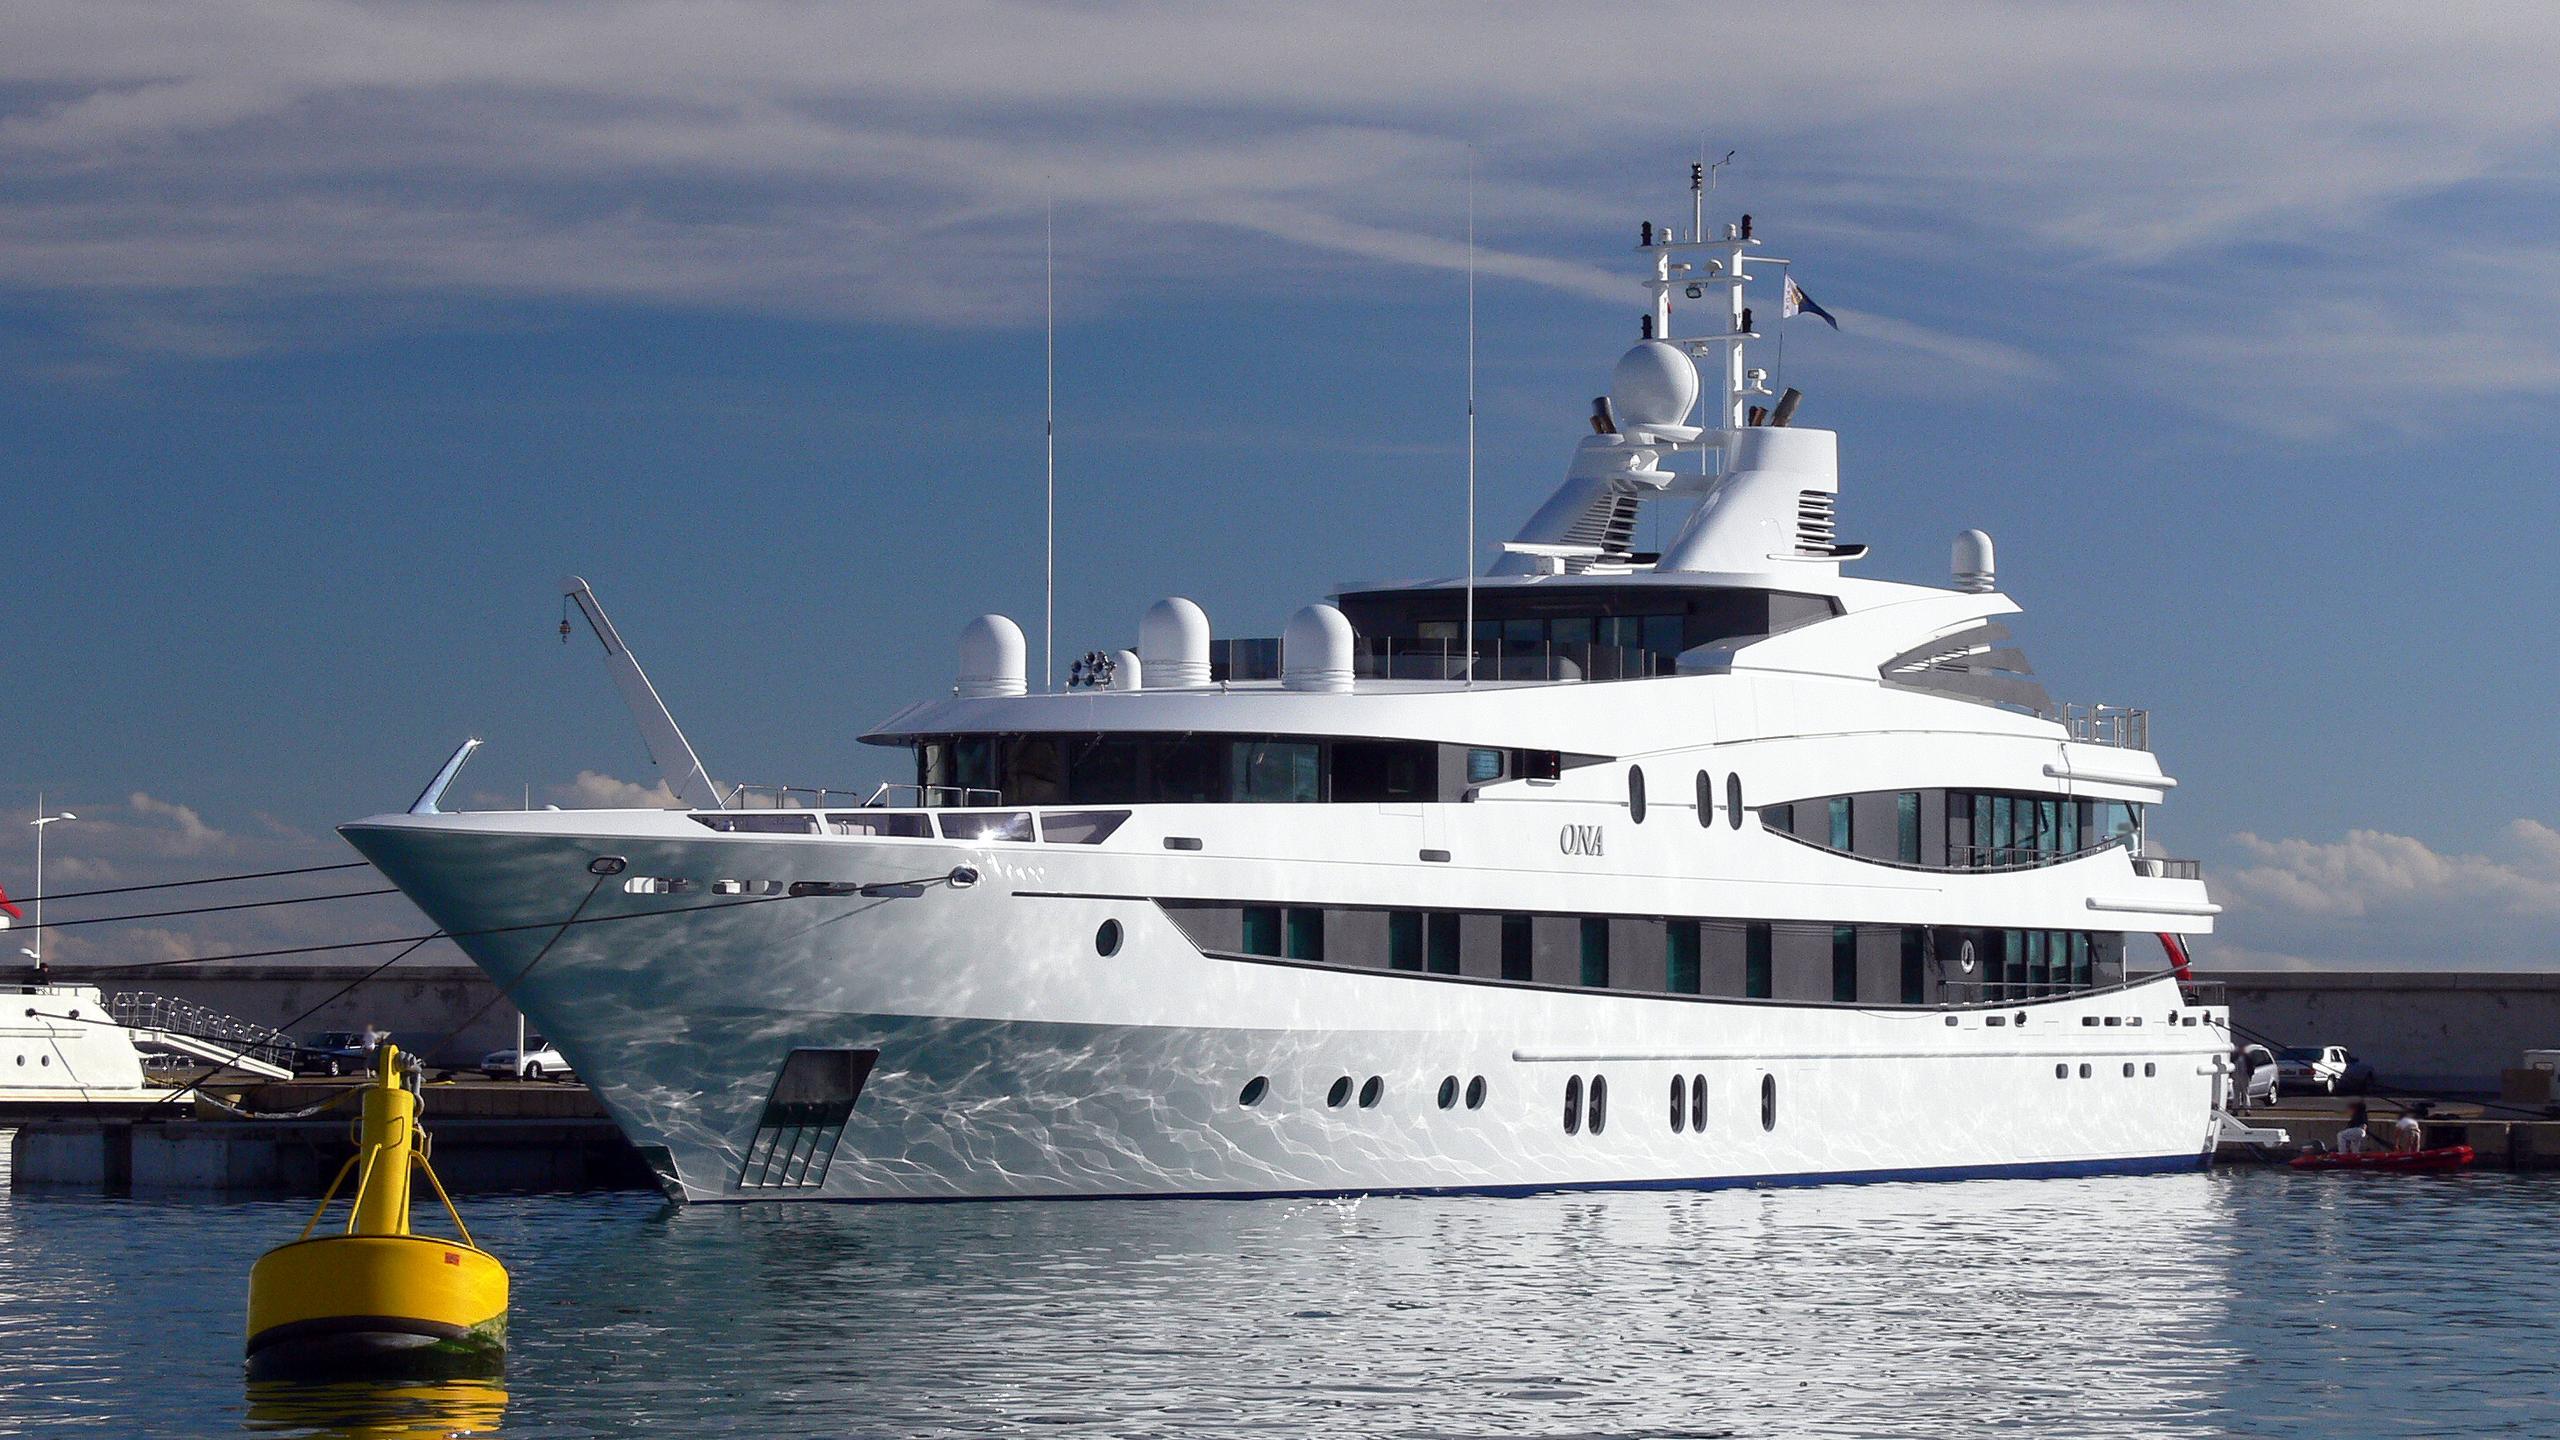 luna b natita motoryacht oceanco 2005 66m bow